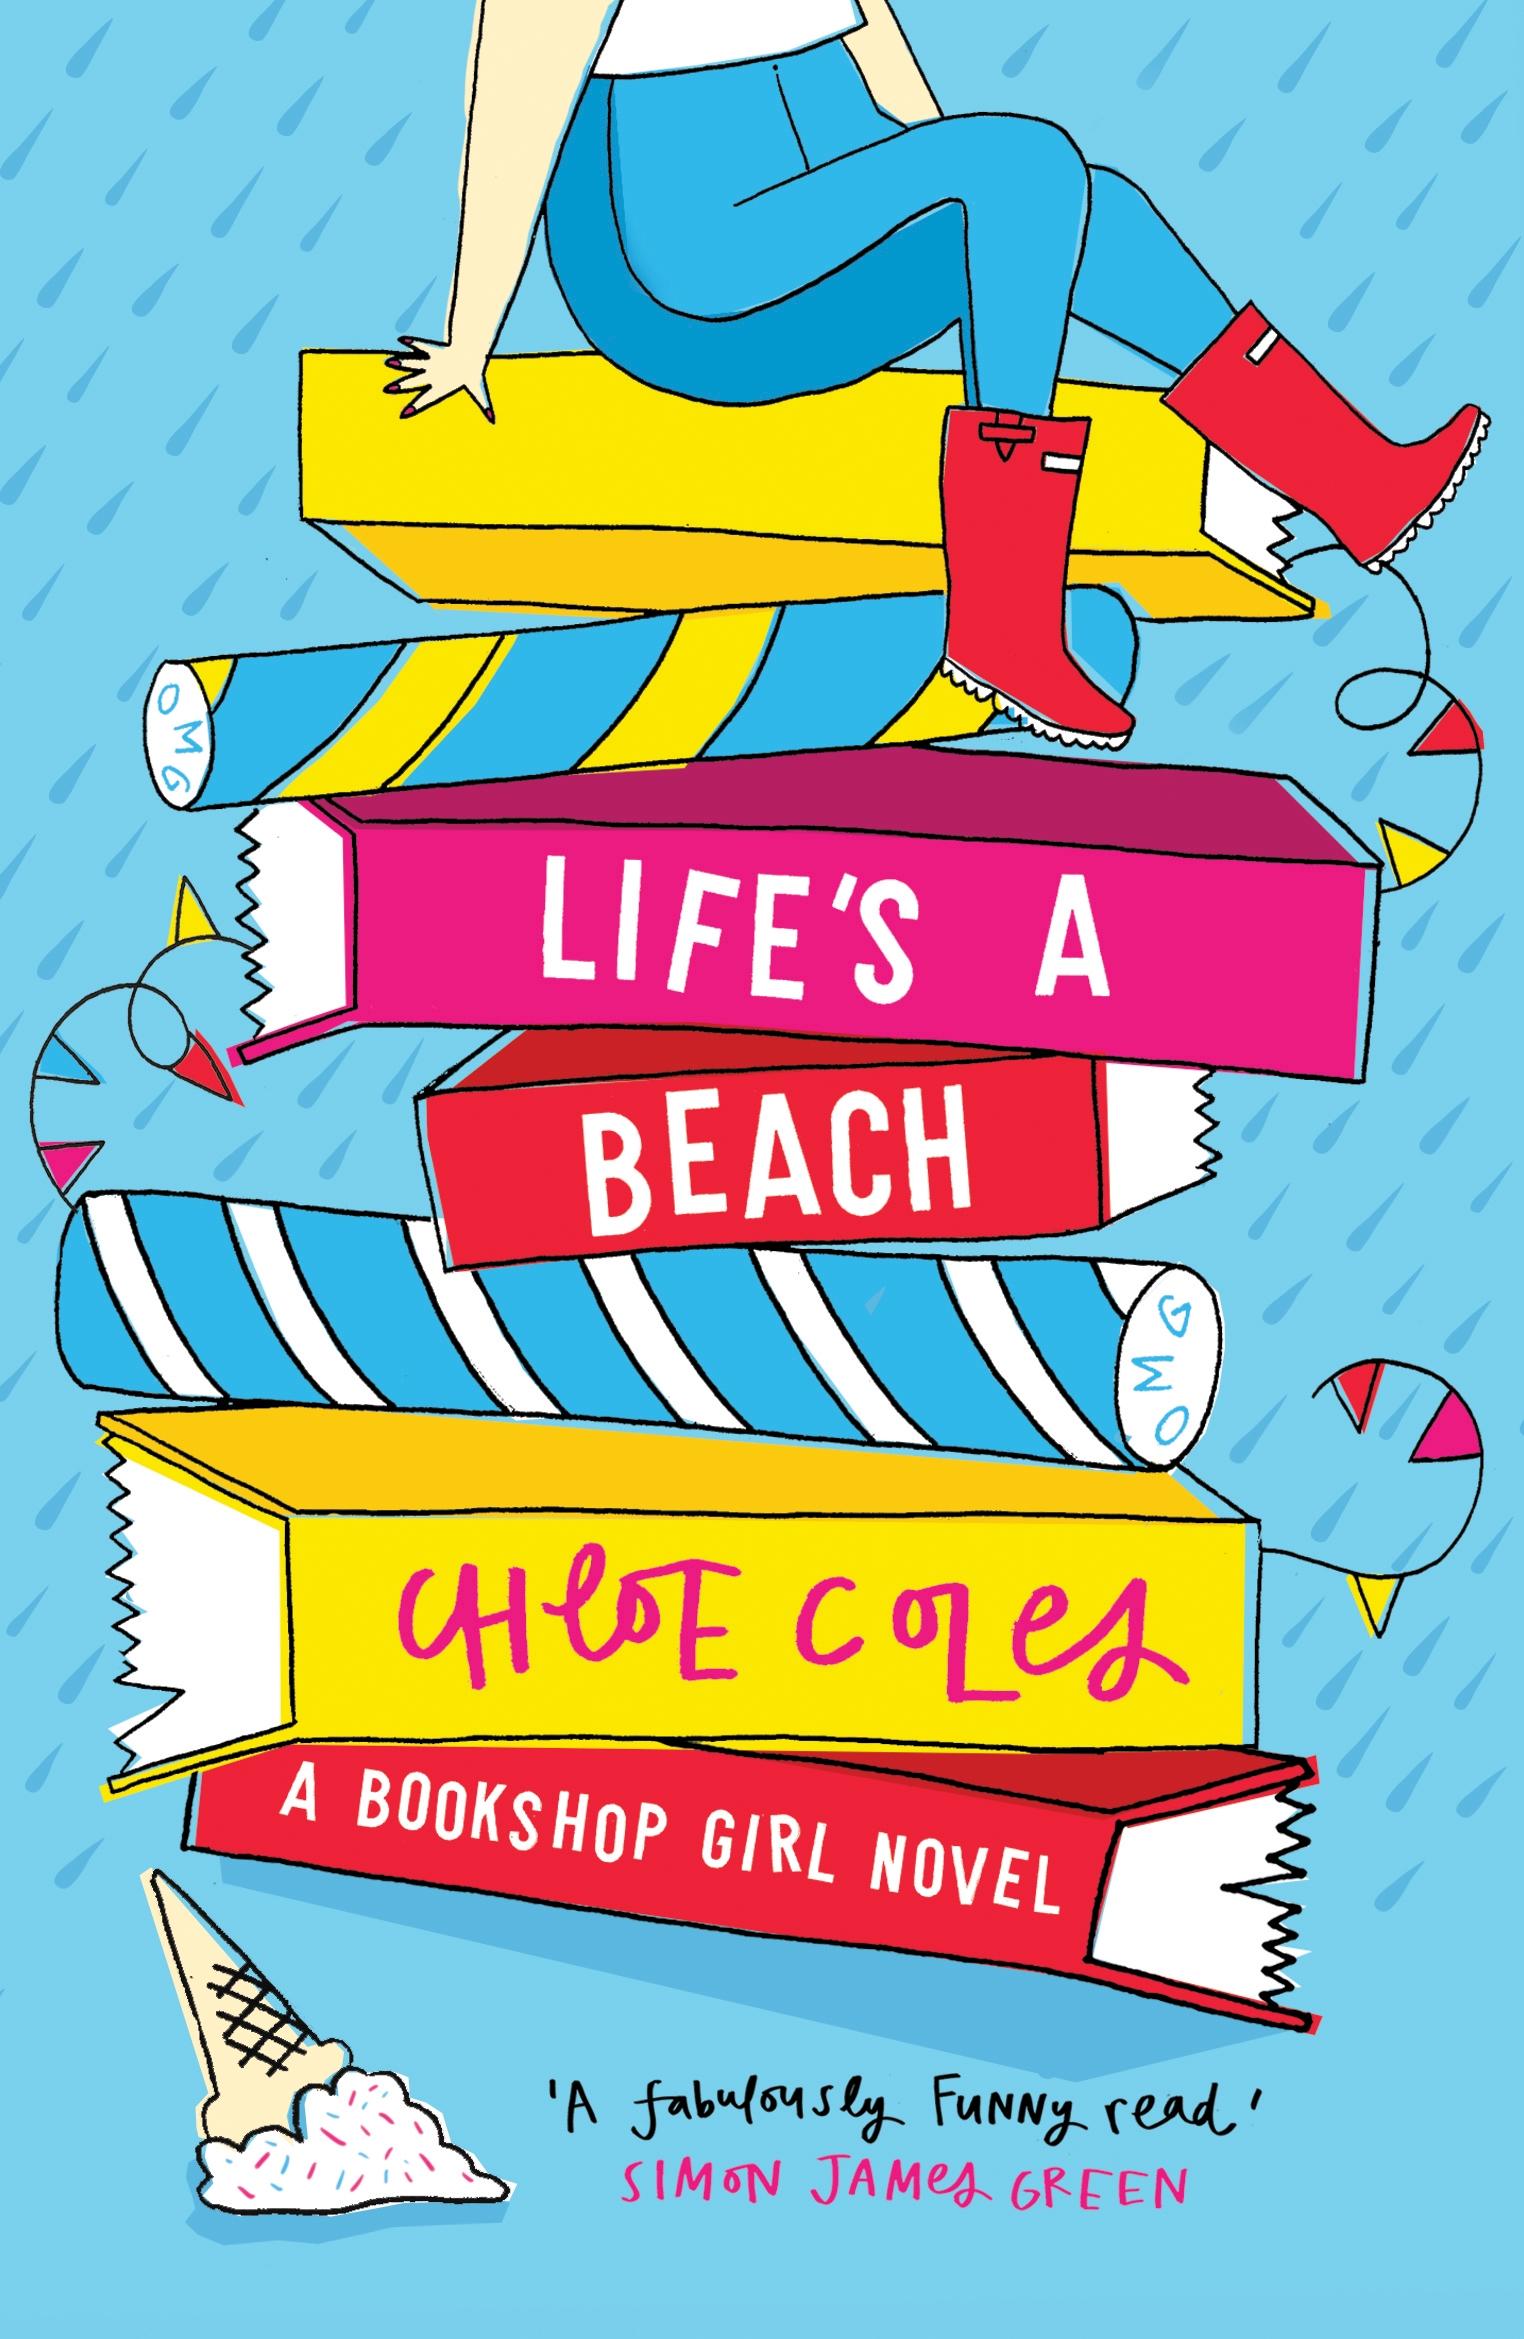 Bookshop Girl: Life's a Beach by Chloe Coles